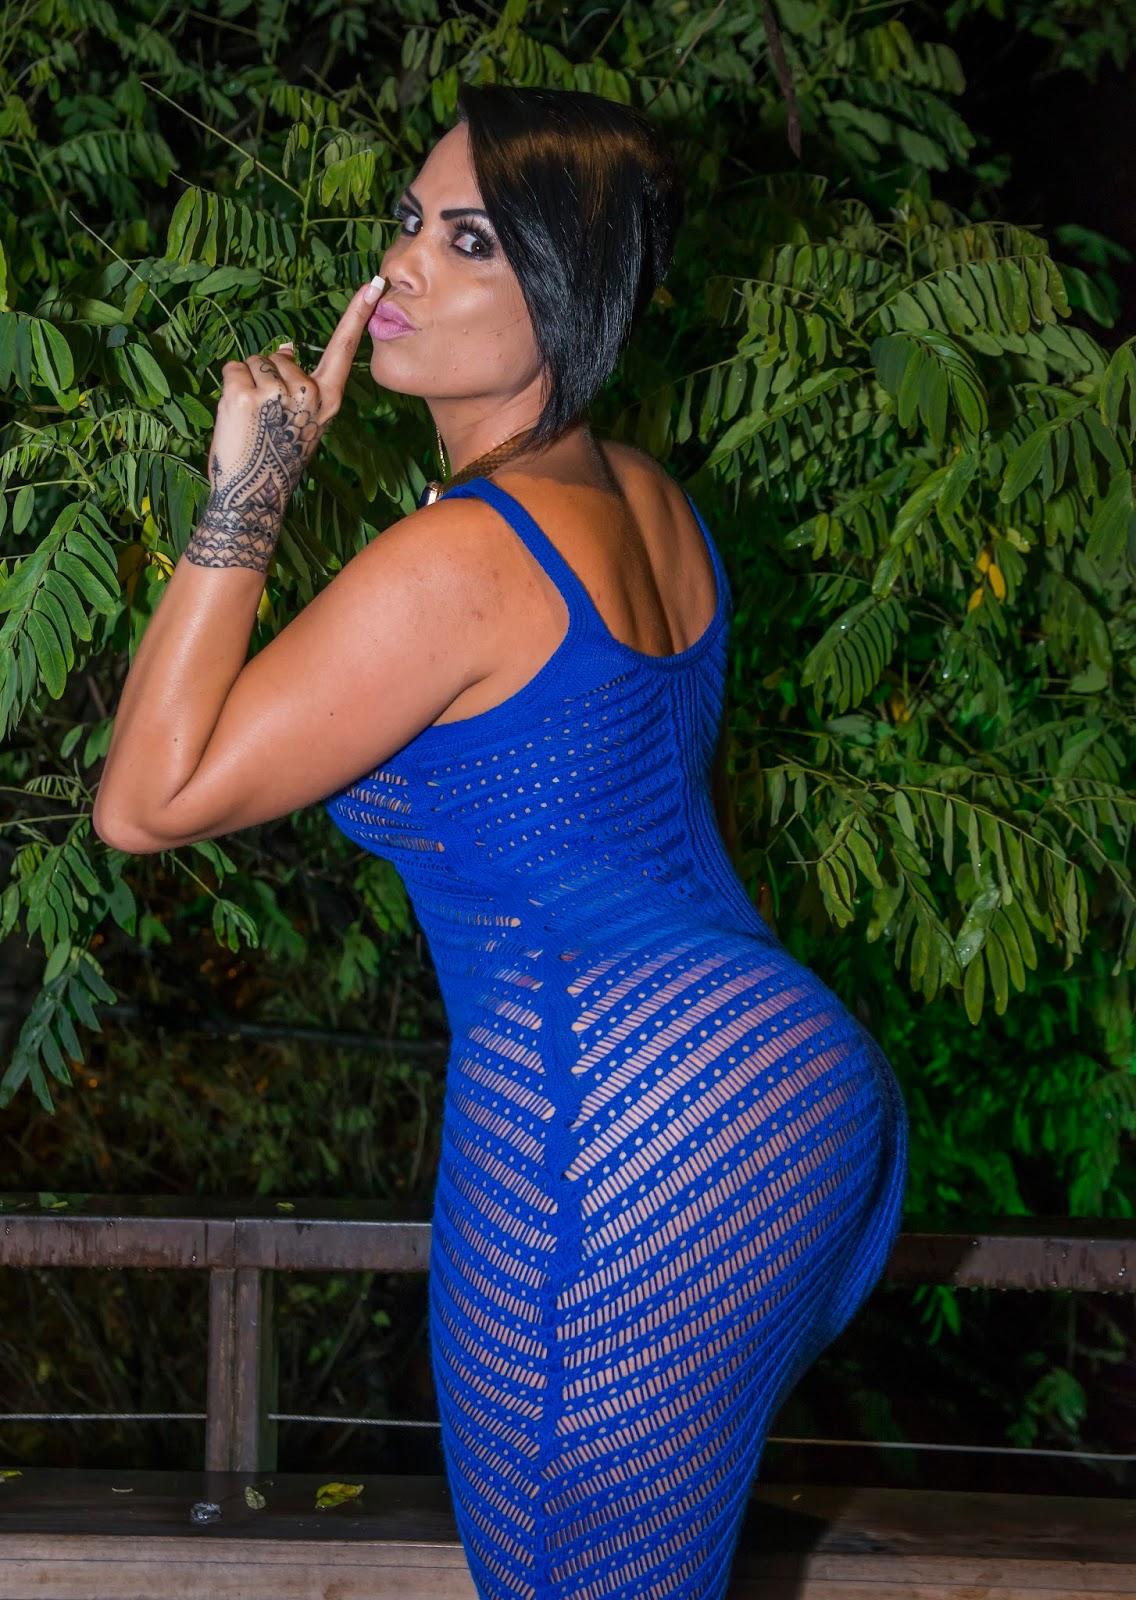 Carine Felizardo nude (92 fotos), photos Feet, Snapchat, cleavage 2018